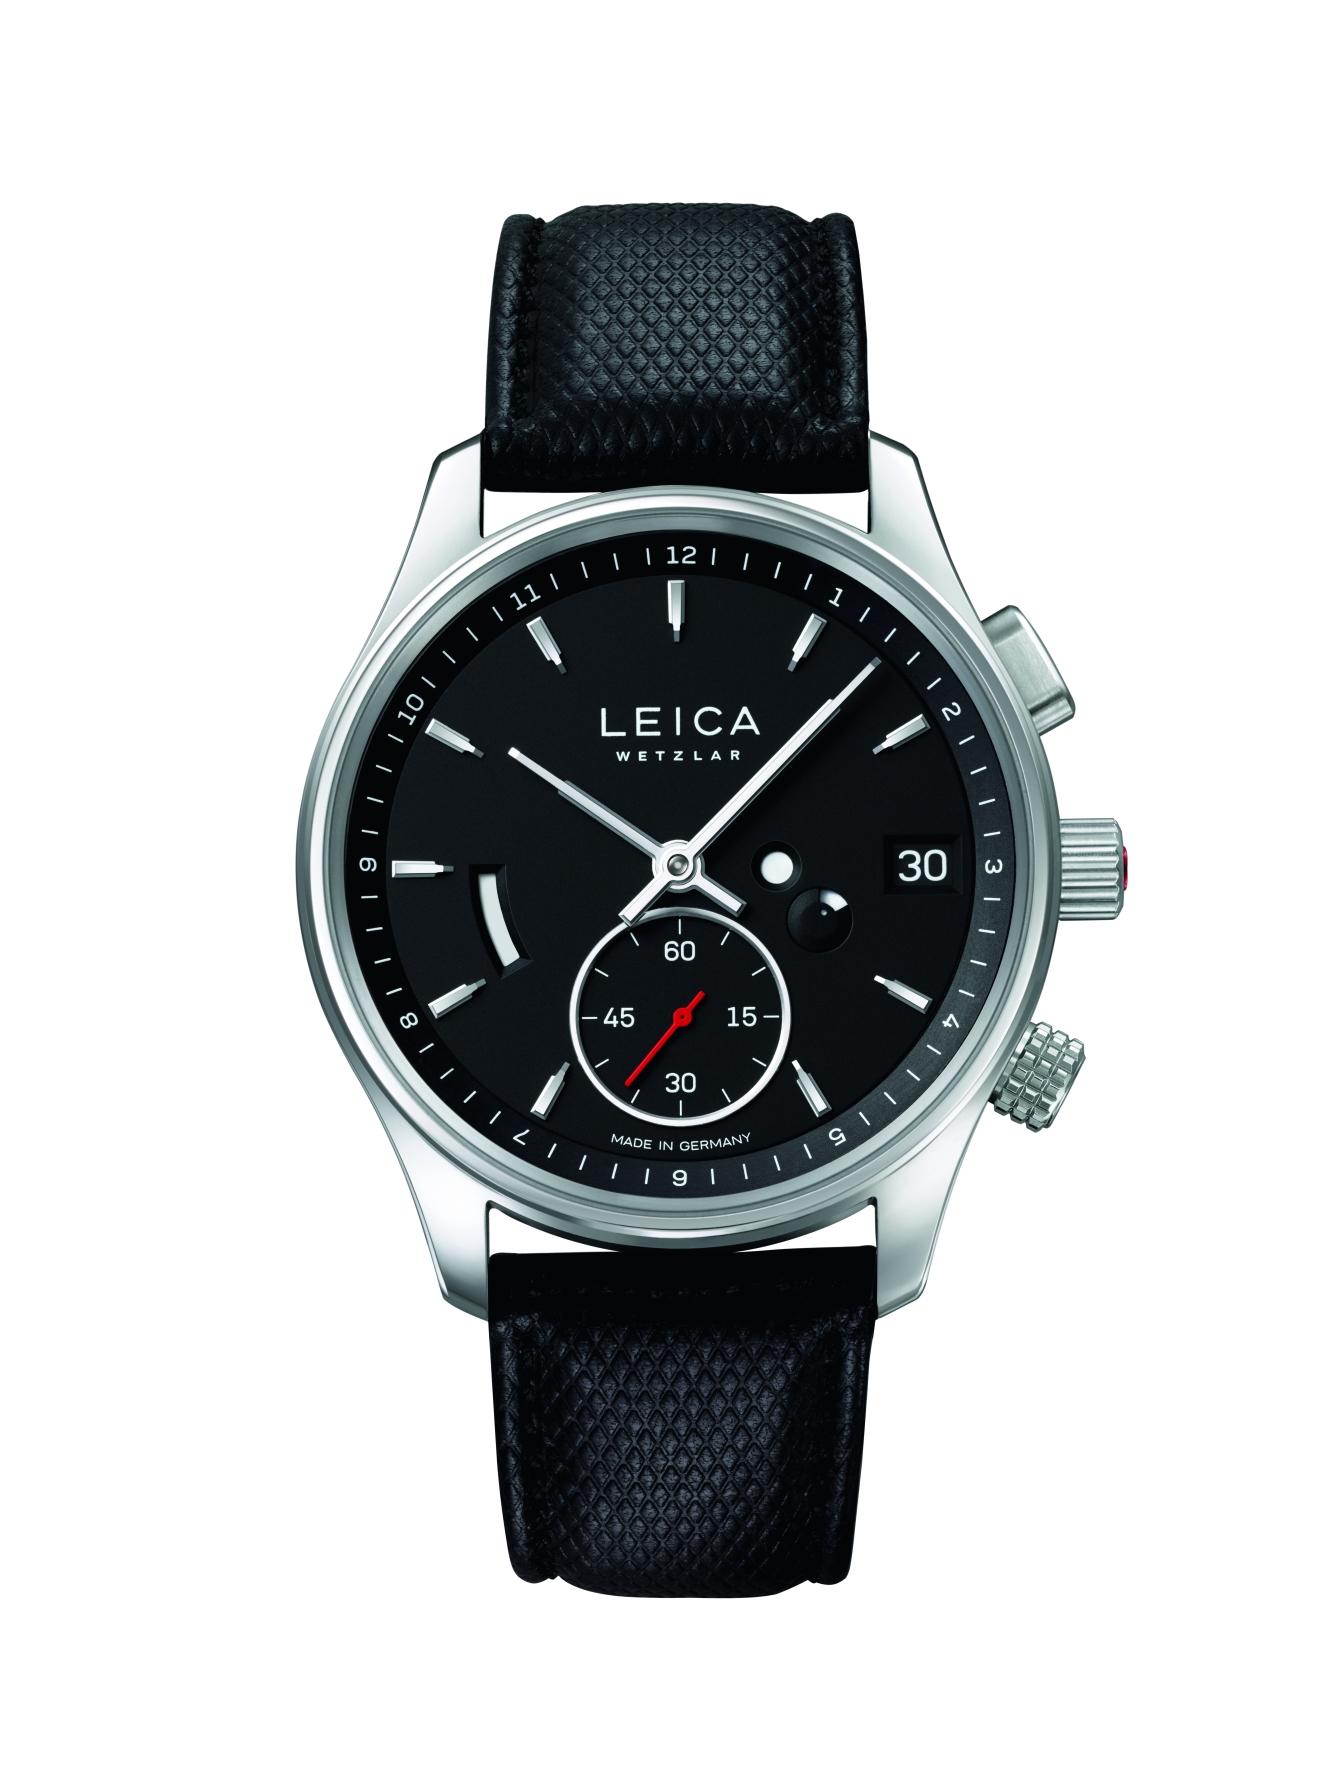 Leica L2 black